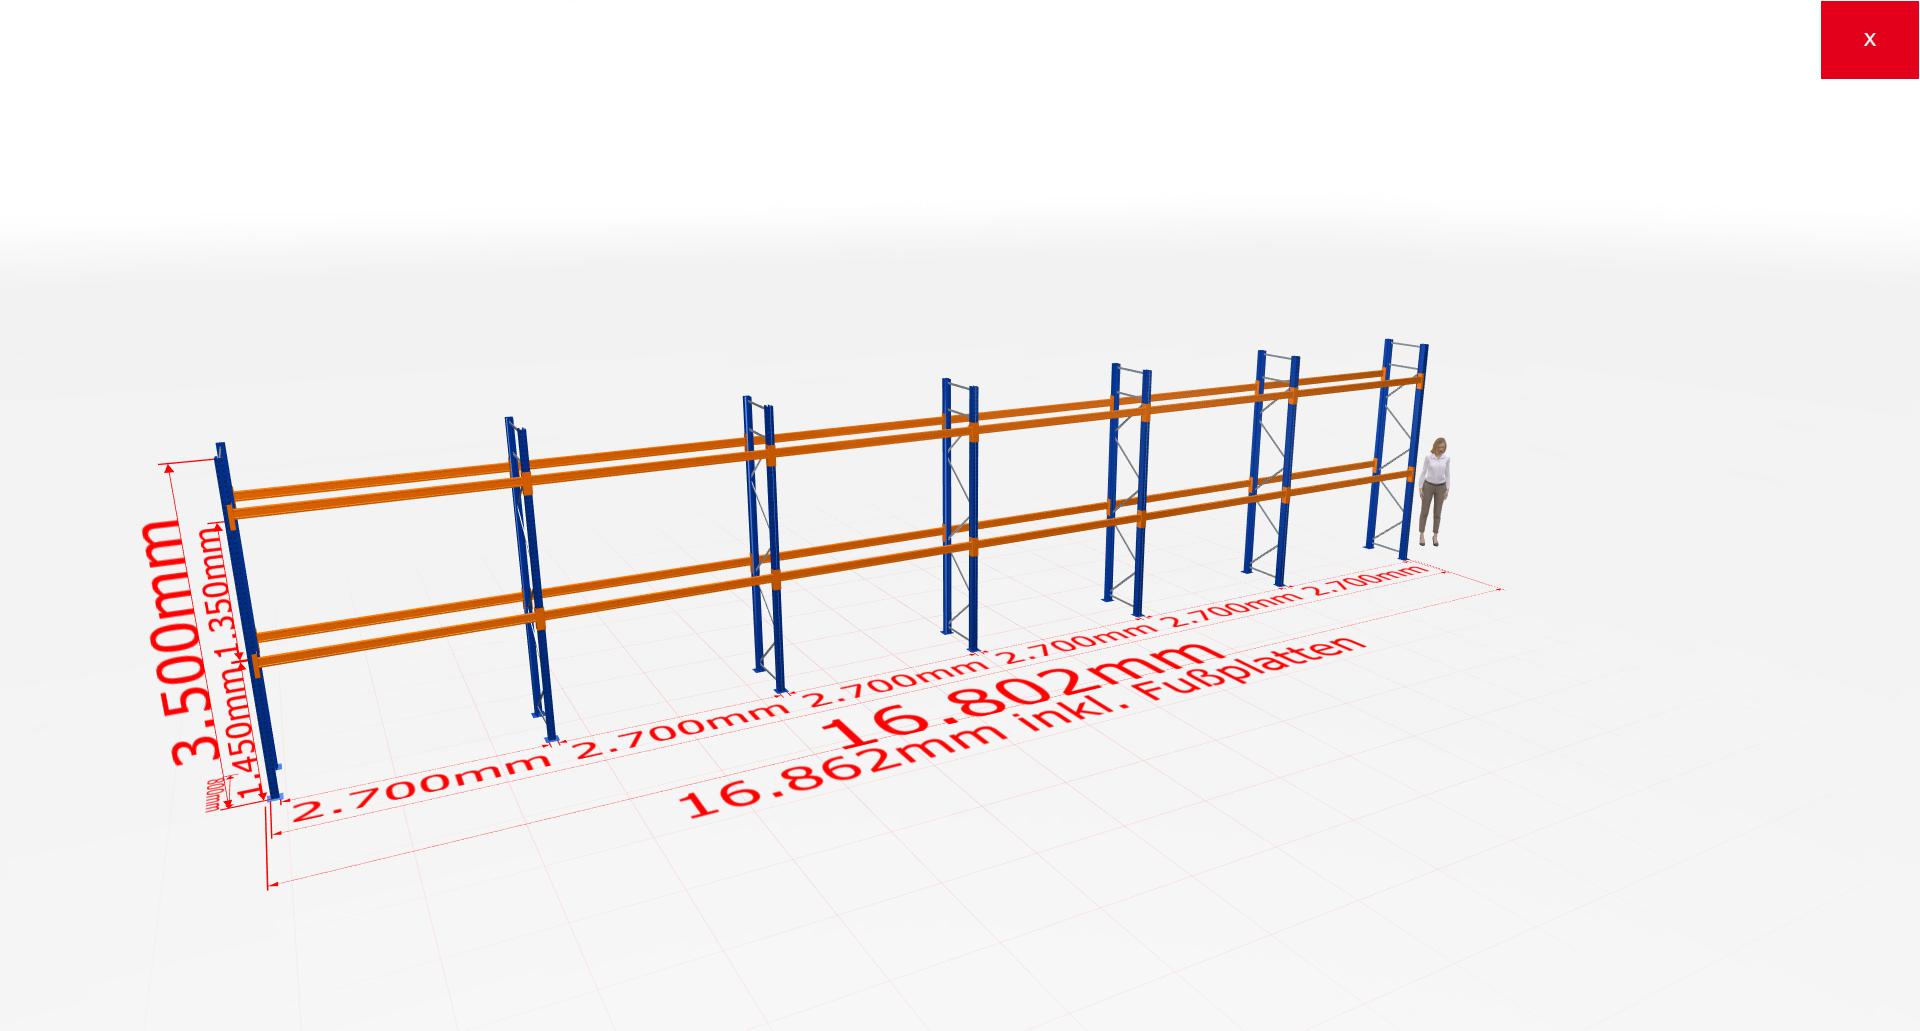 Palettenregal Komplettregal 3500x16802x800 mm (HxBxT) 2 Fachebenen SCHULTE Lagertechnik